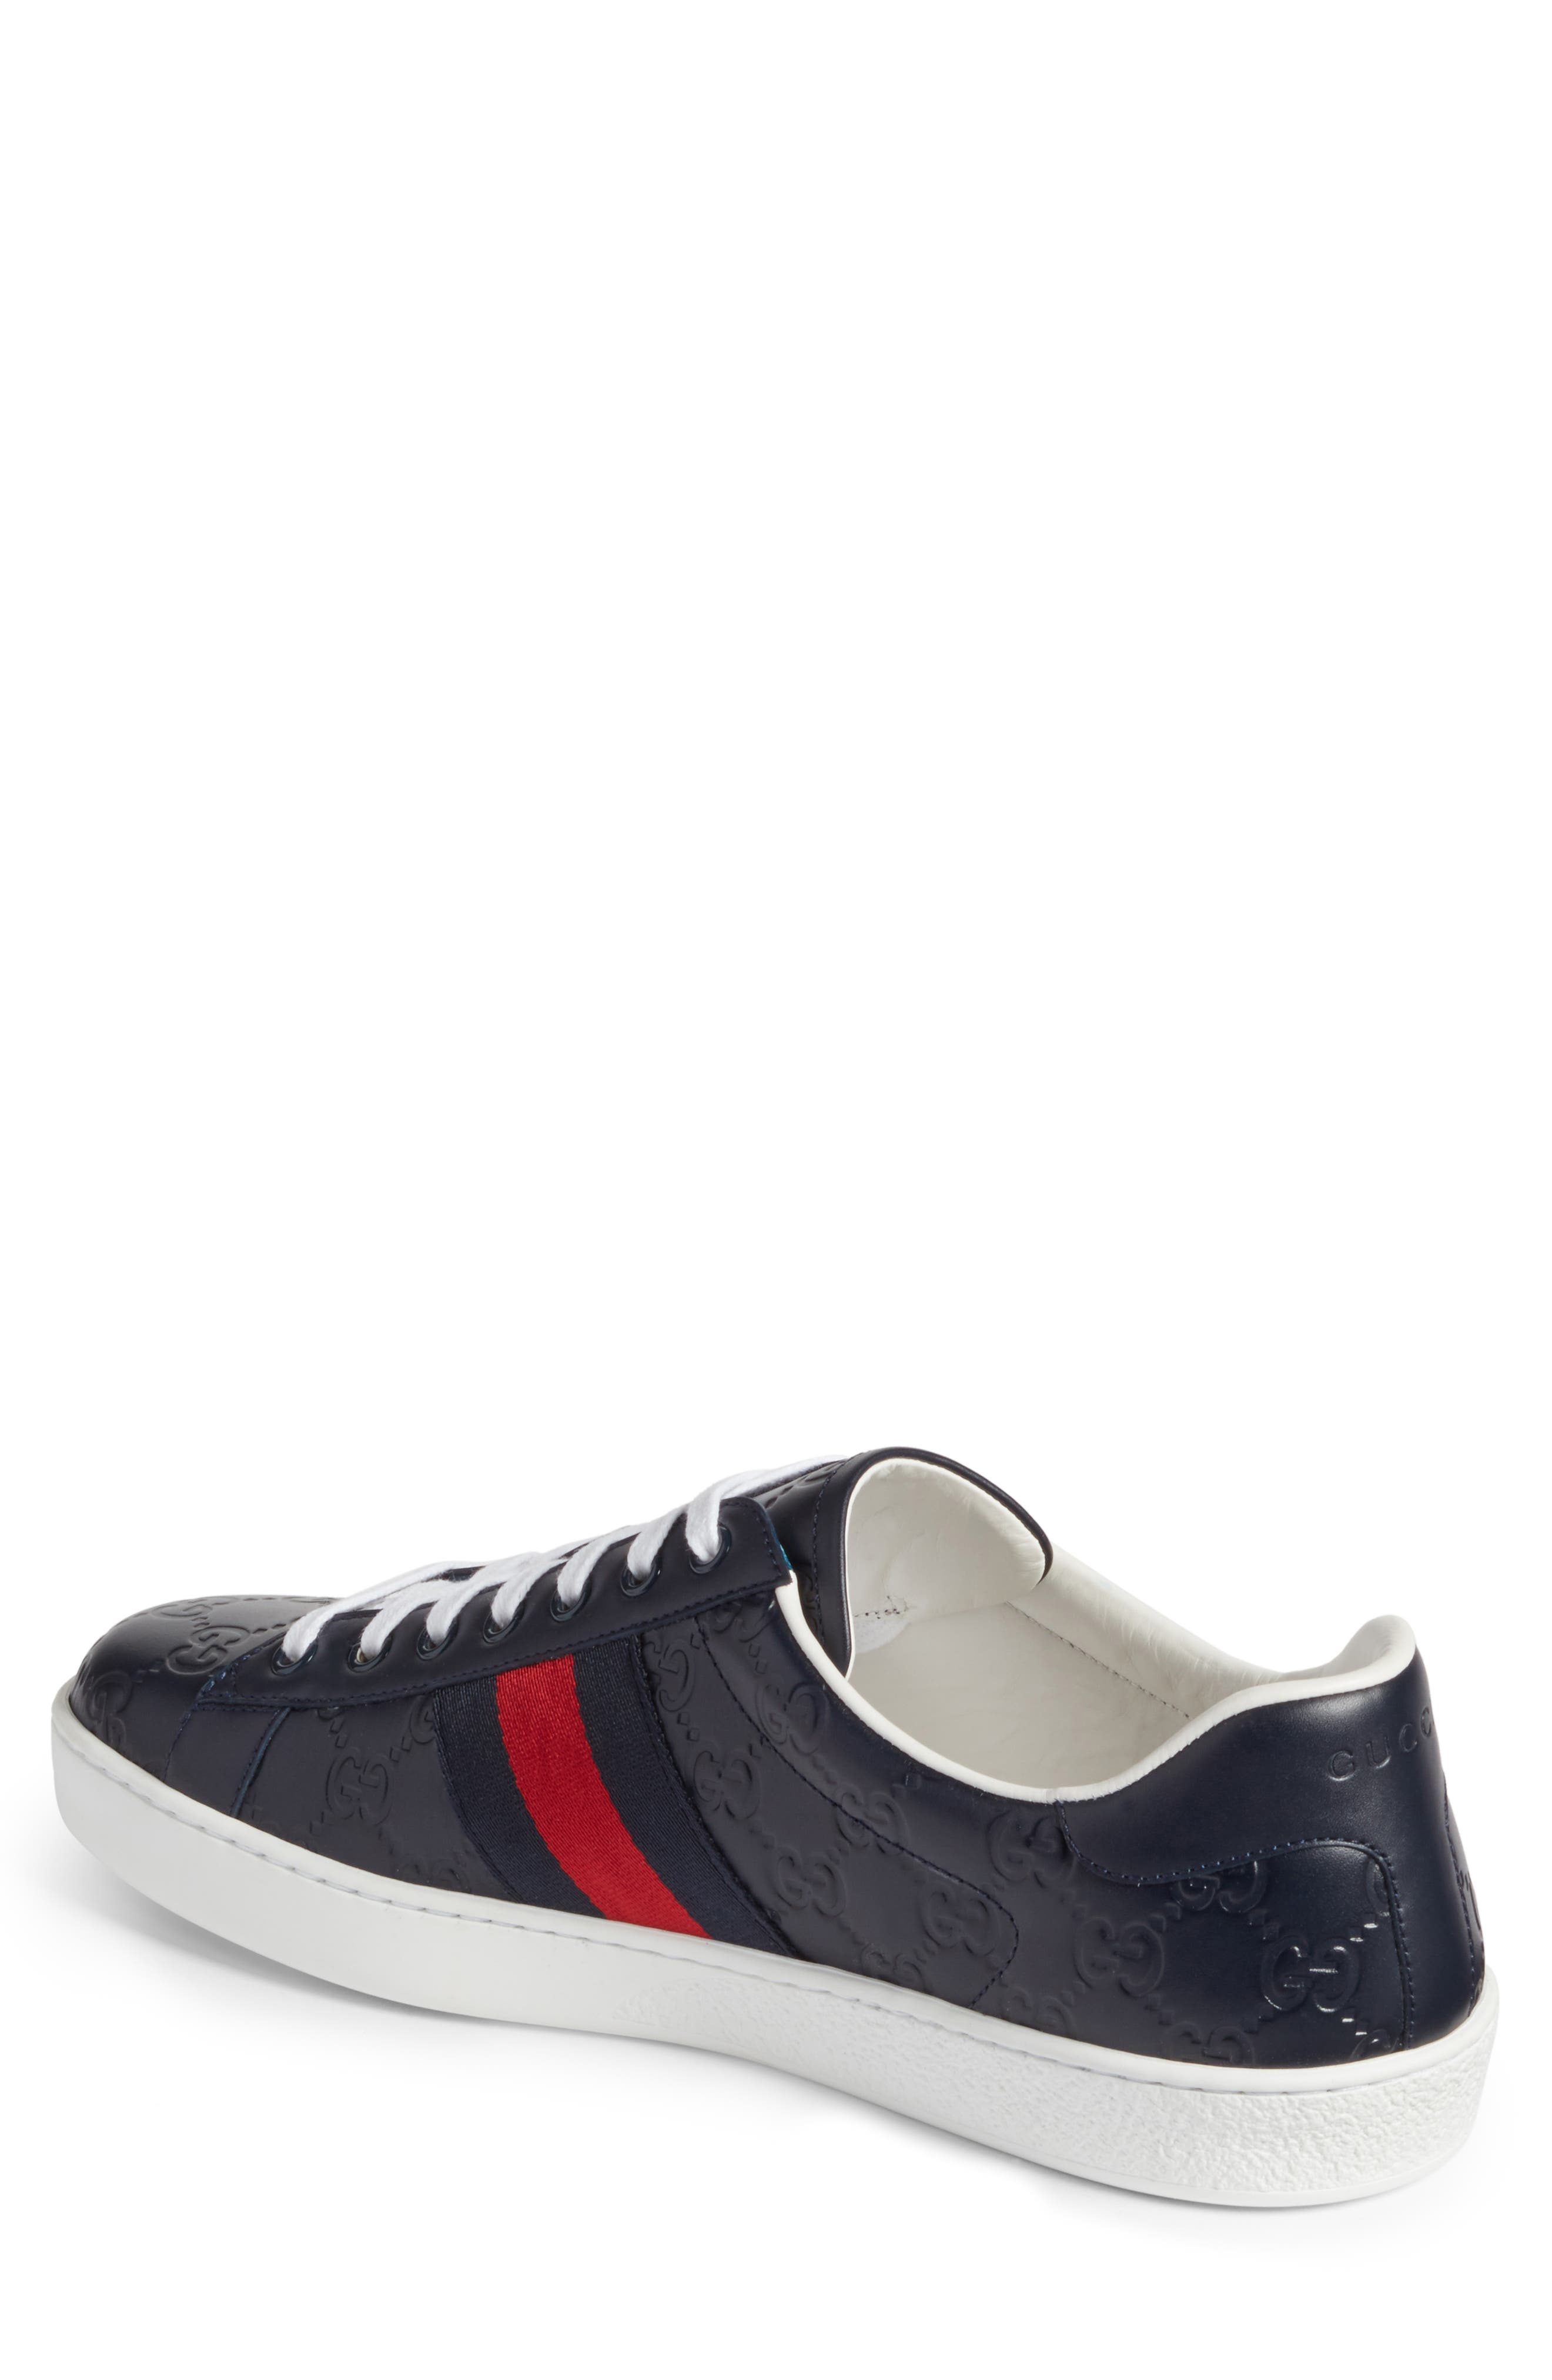 Alternate Image 2  - Gucci 'New Ace' Sneaker (Men)